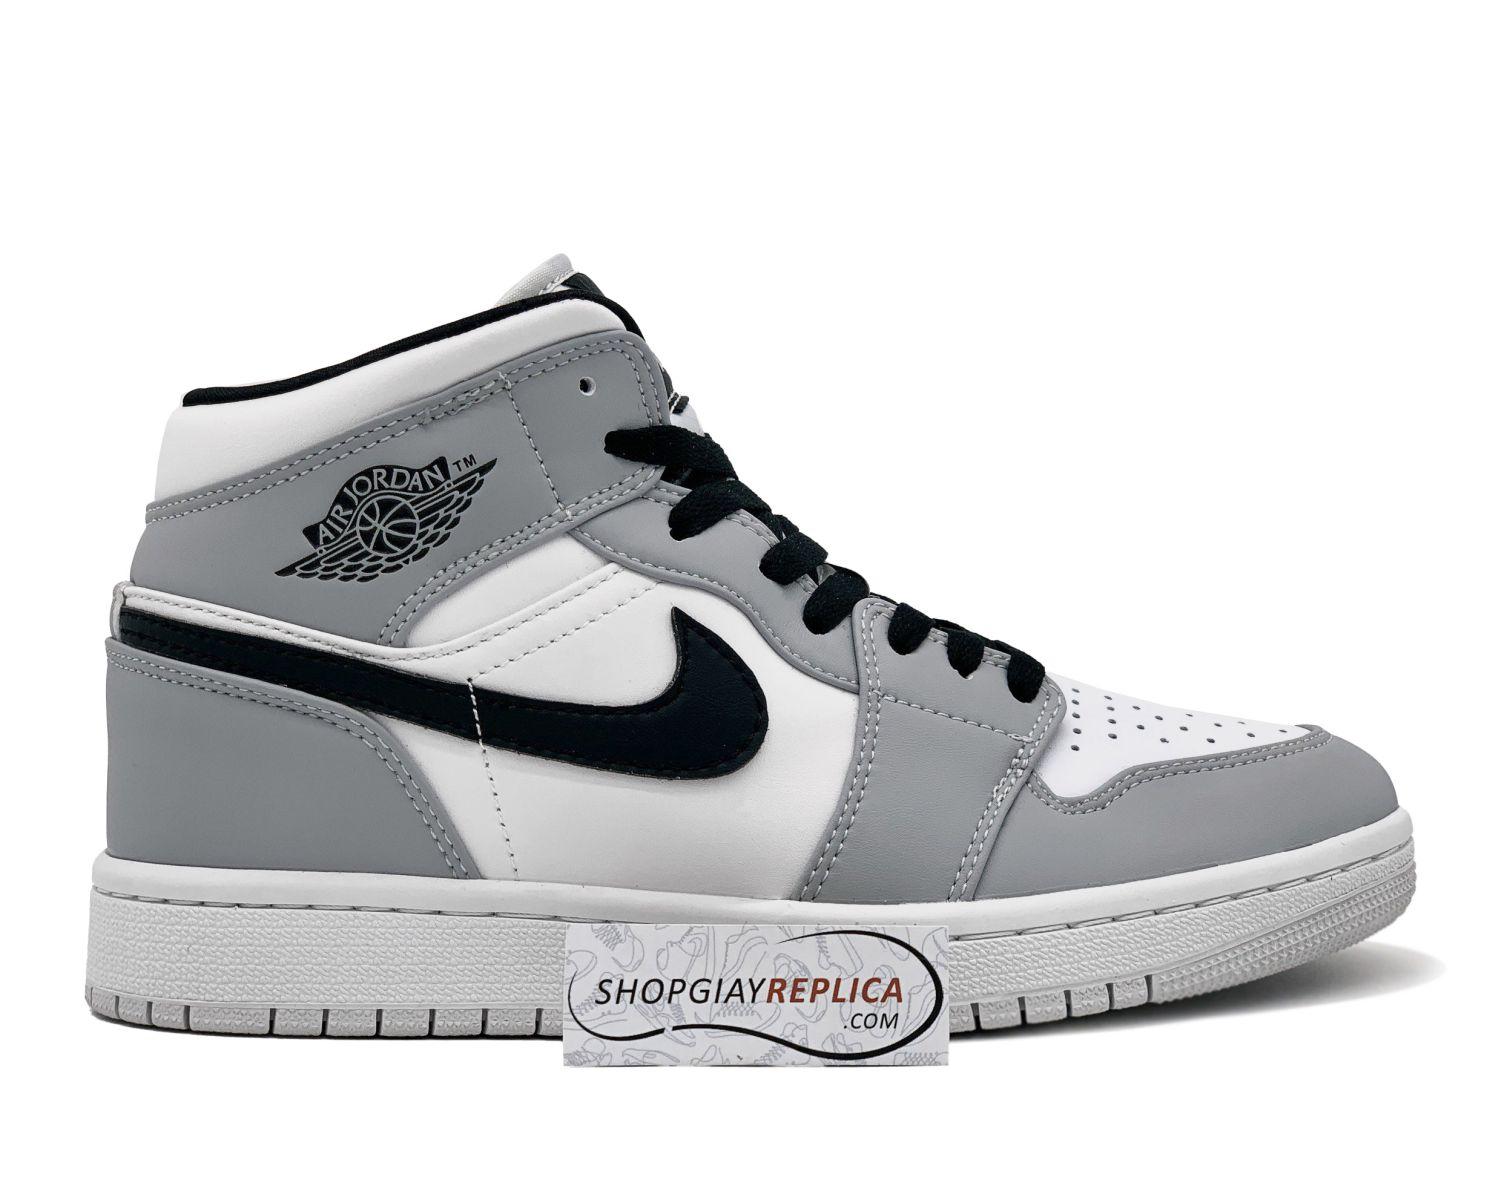 giày air jordan 1 mid rep 1:1